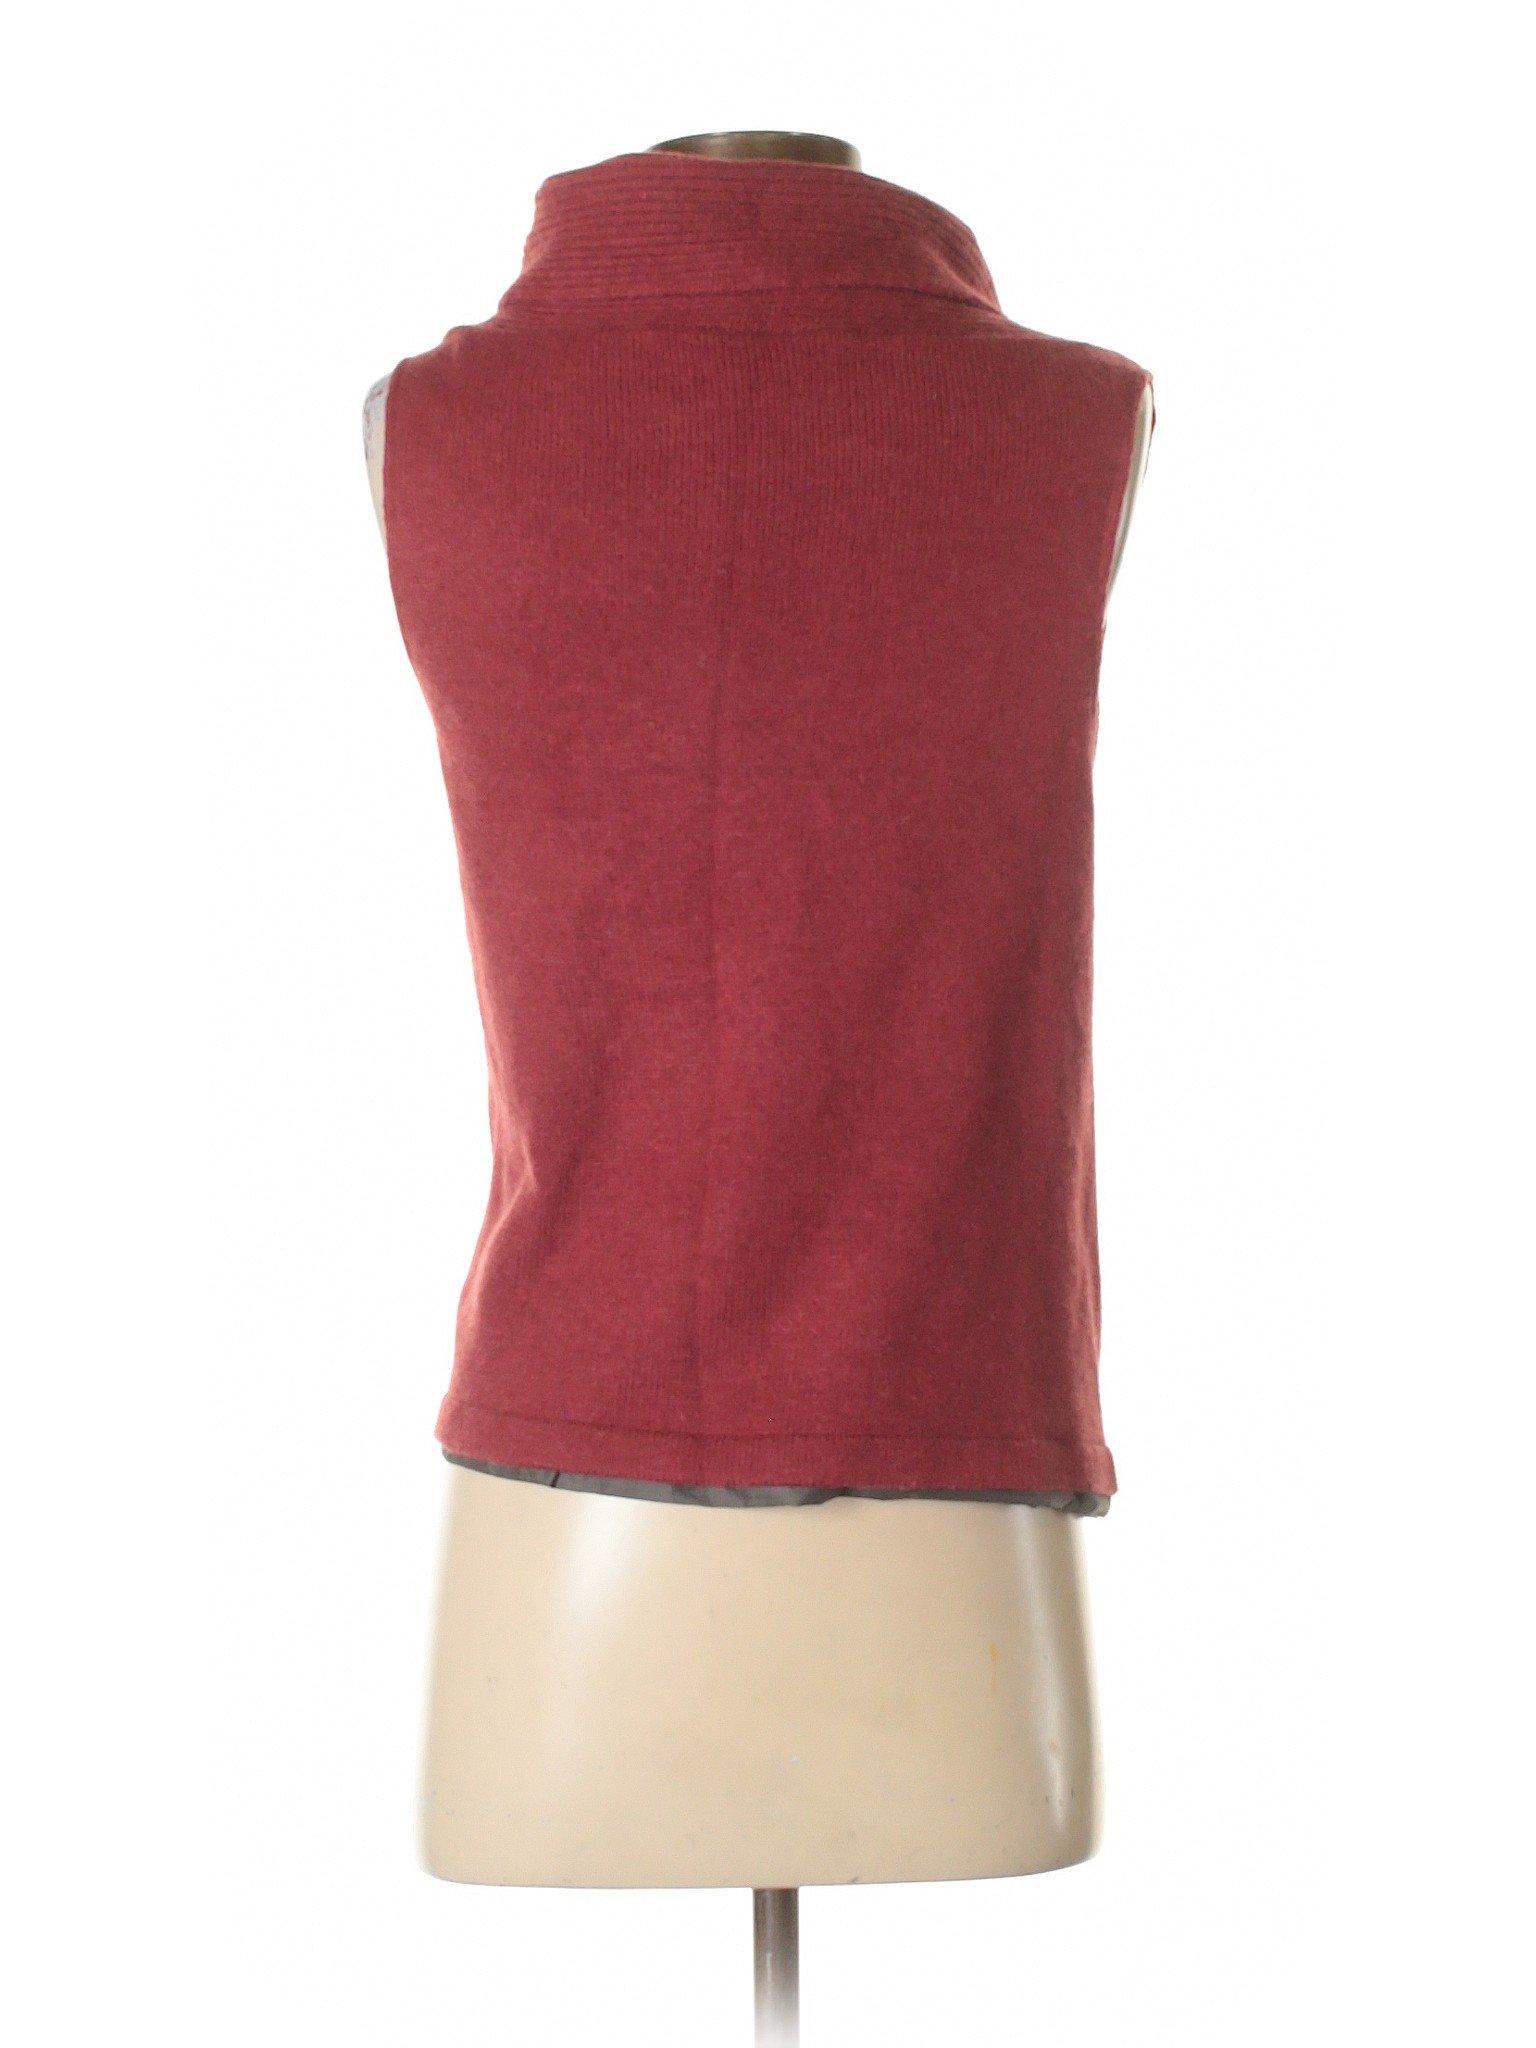 Wool Cardigan Boutique Rivamonti Rivamonti Boutique RqUO1Rpvw